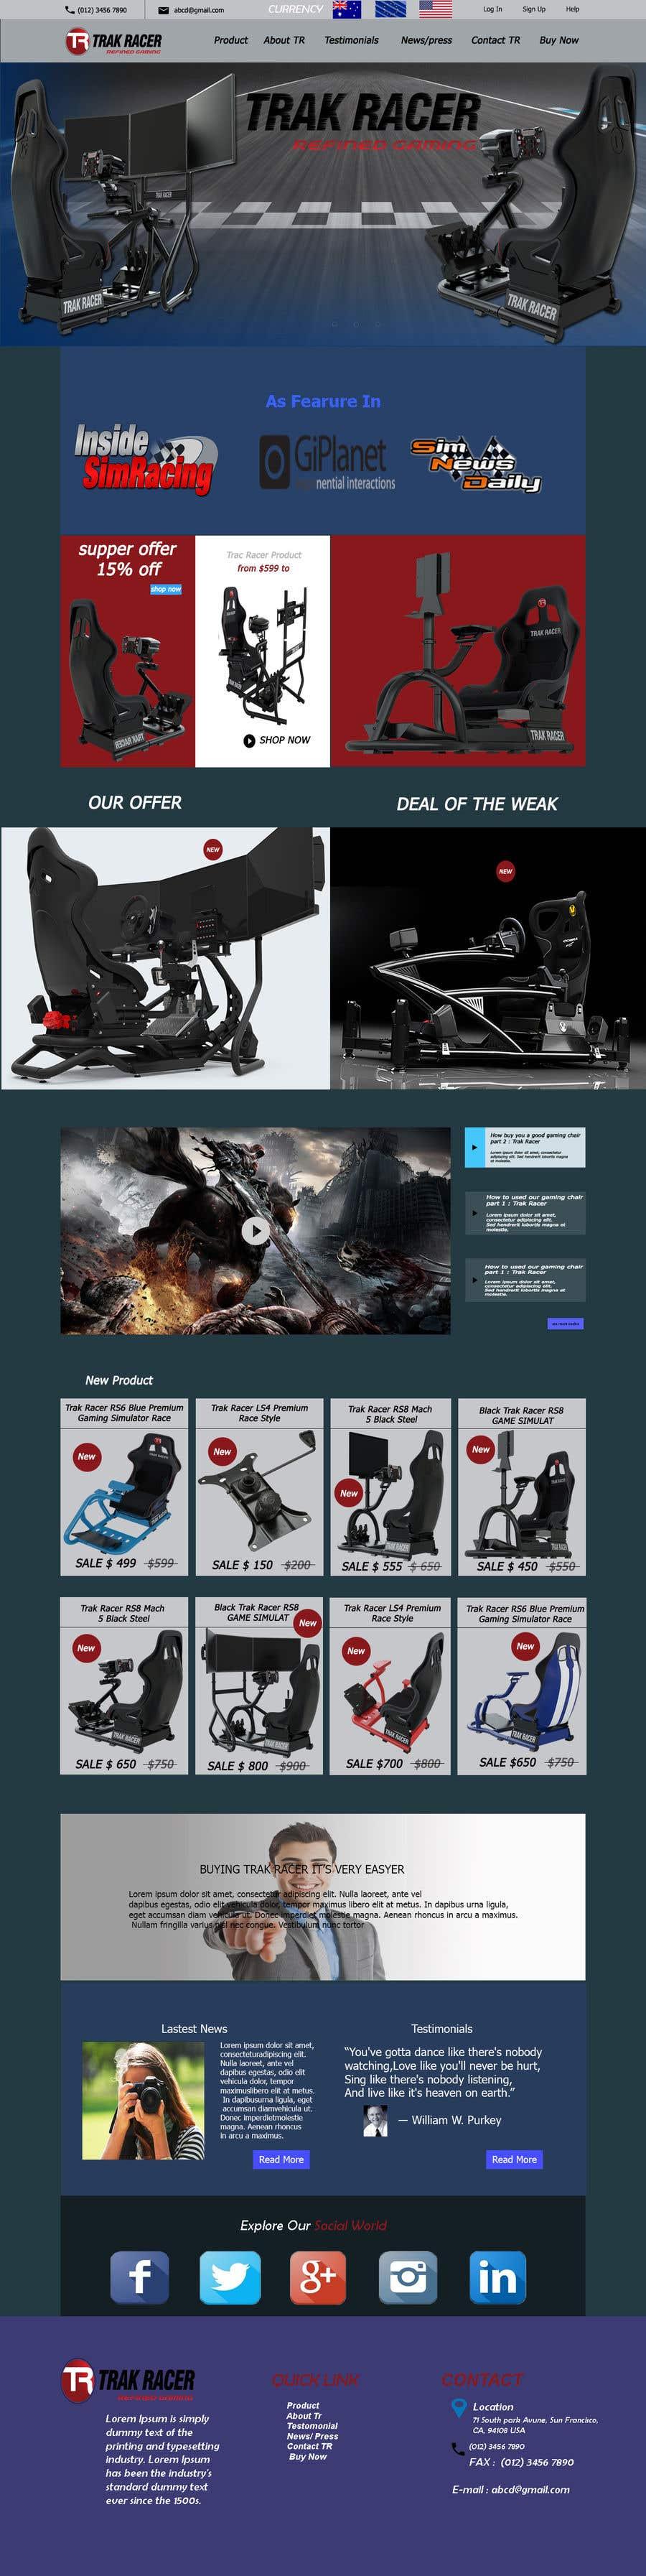 Penyertaan Peraduan #25 untuk Design a home page including header and footer